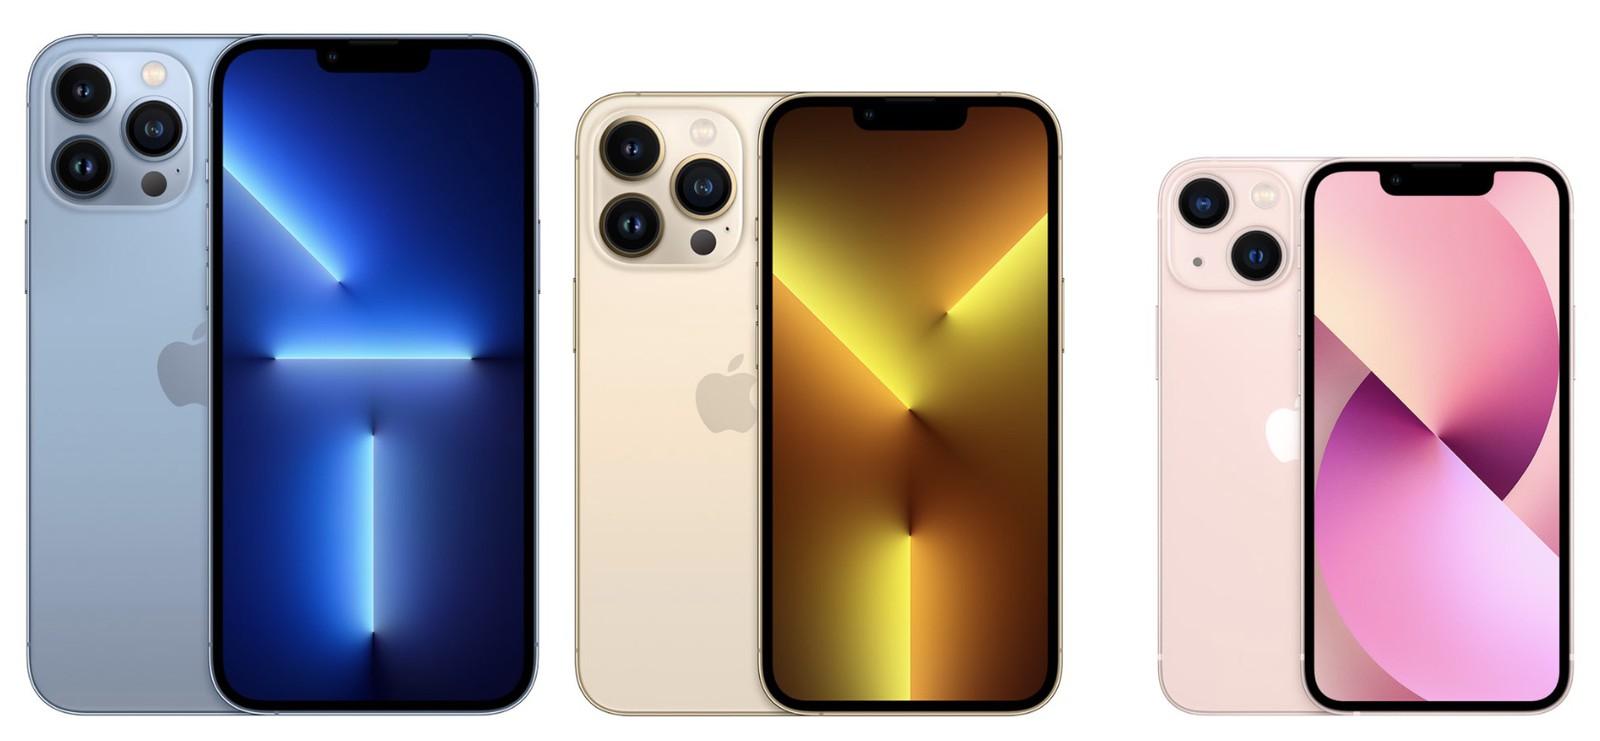 iPhone 13来了,iPhone 13续航怎么样?